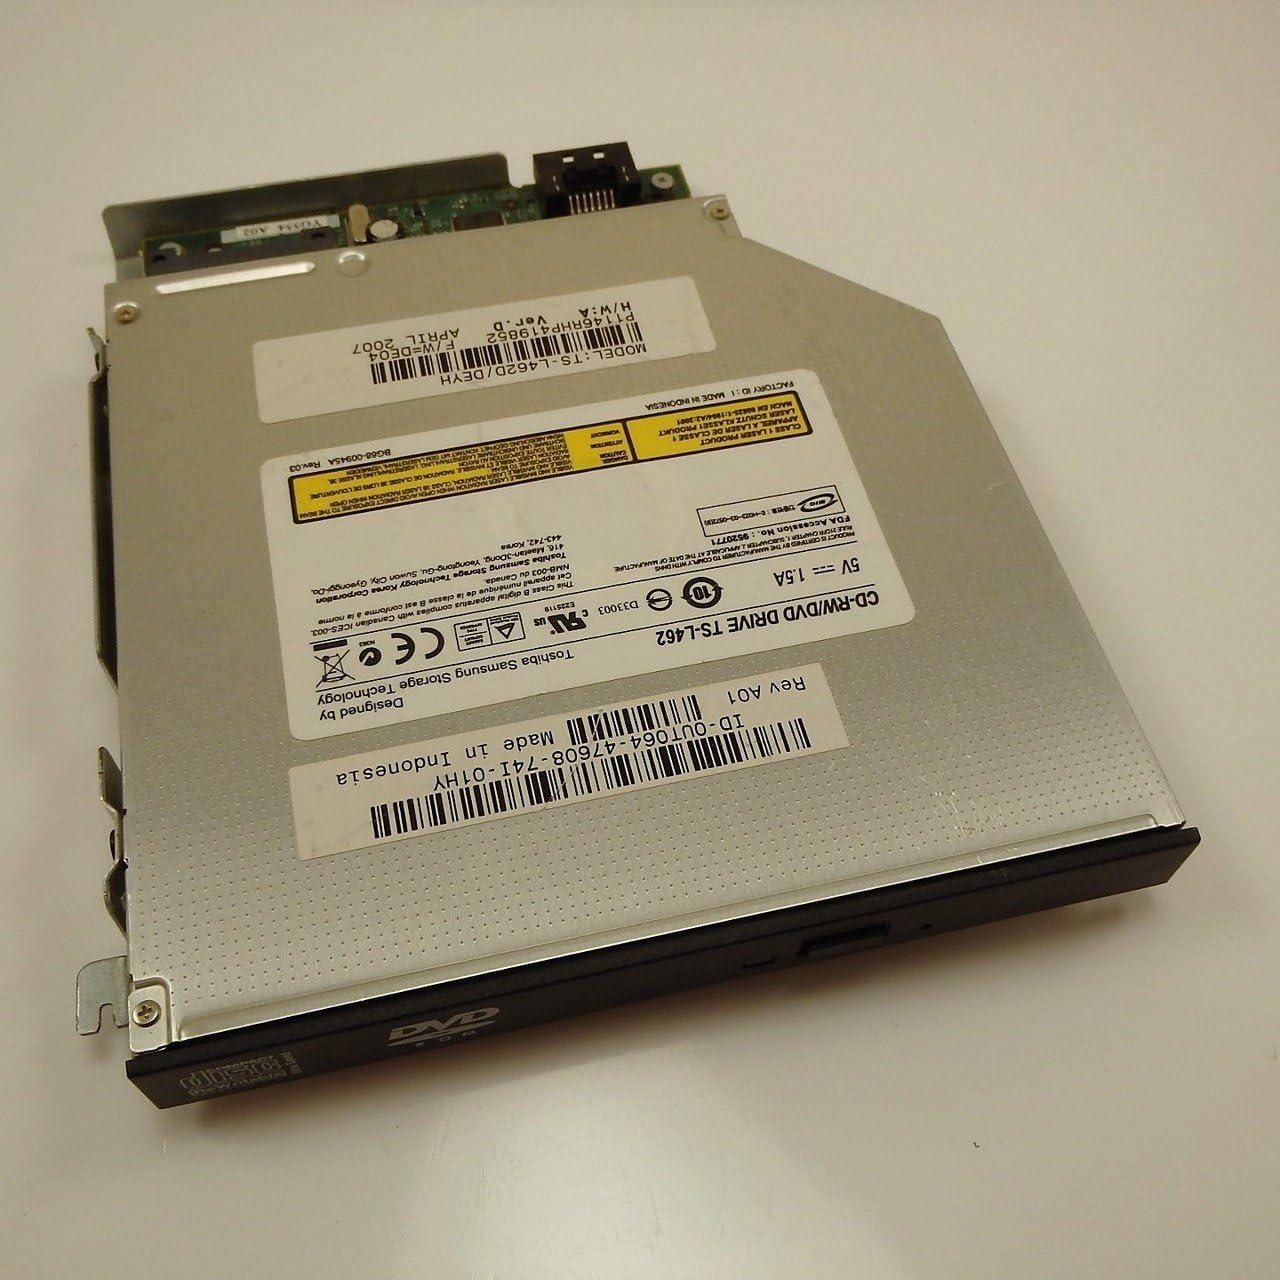 Genuine Dell CD Burner CD-RW / DVD-ROM IDE Slim Internal Optical Drive, Replaces Dell Part Numbers: 3R122, MK723, CC755, FD167, X1612, M6930, 2D410, P9506, Y8533, R3792, J9236, CC773, H9669, WG939, HM438, UT064